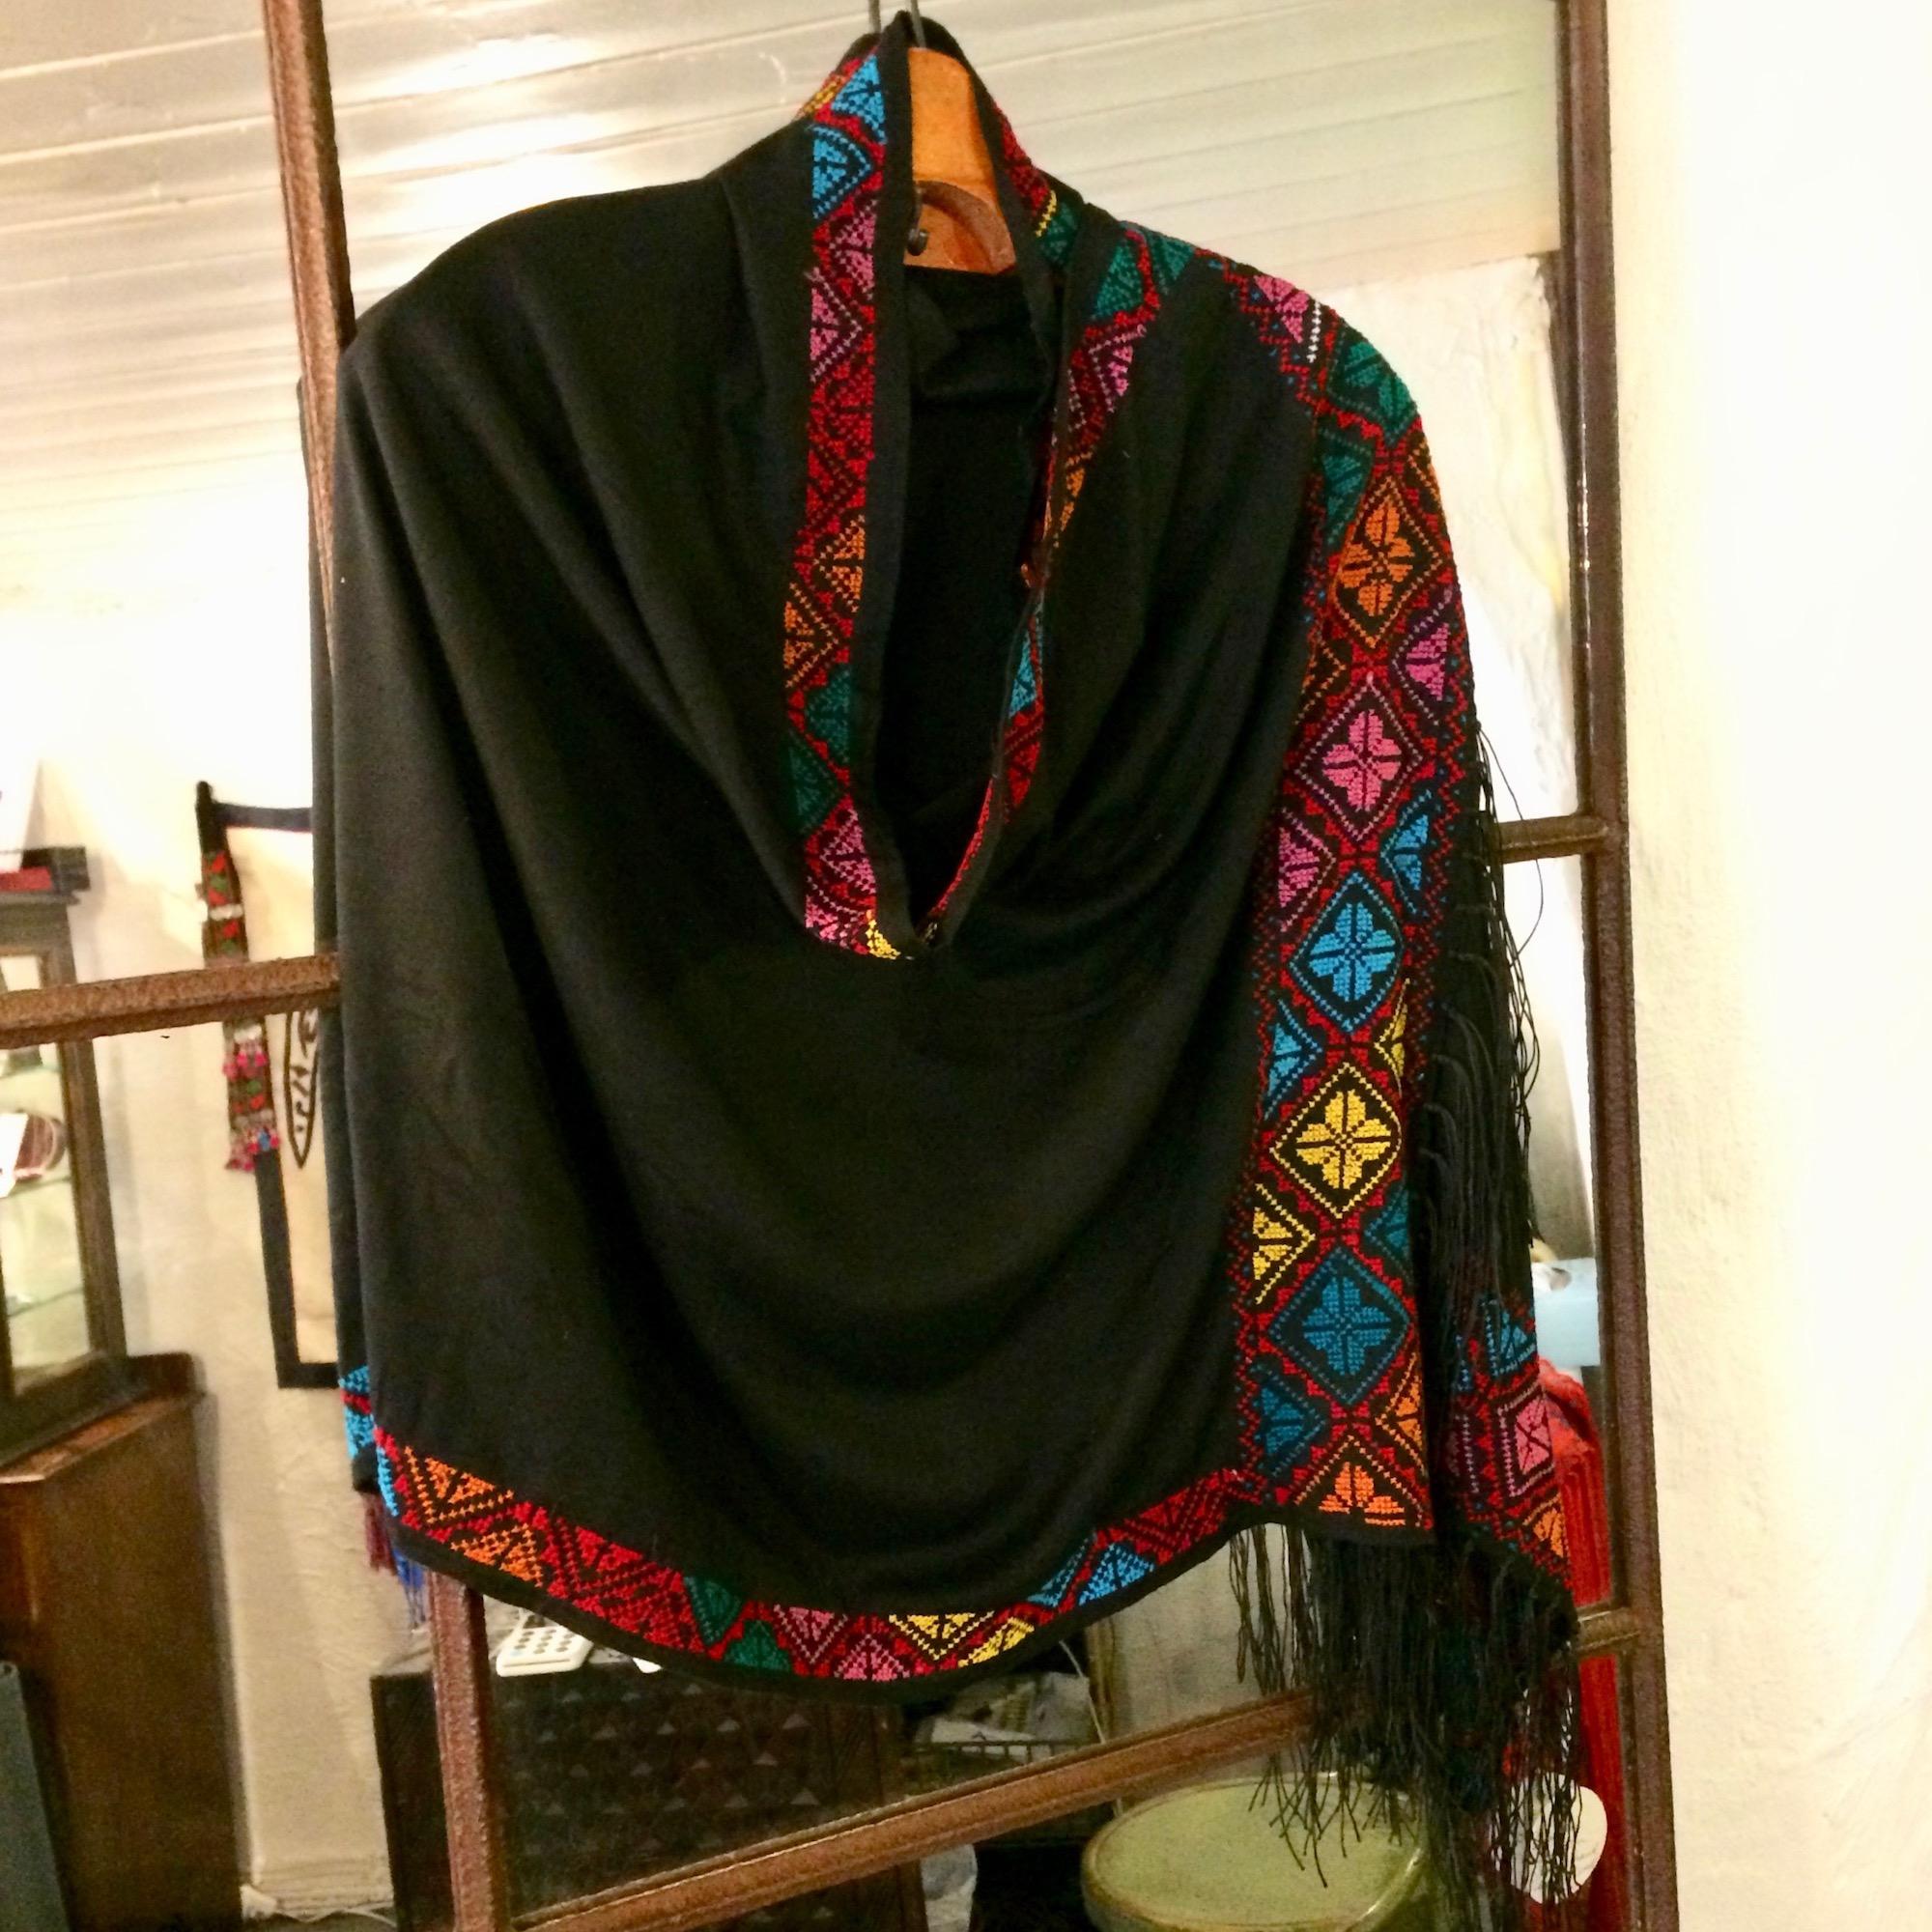 Bedouin Hand-embroidered Rectangular Fringed Shawl